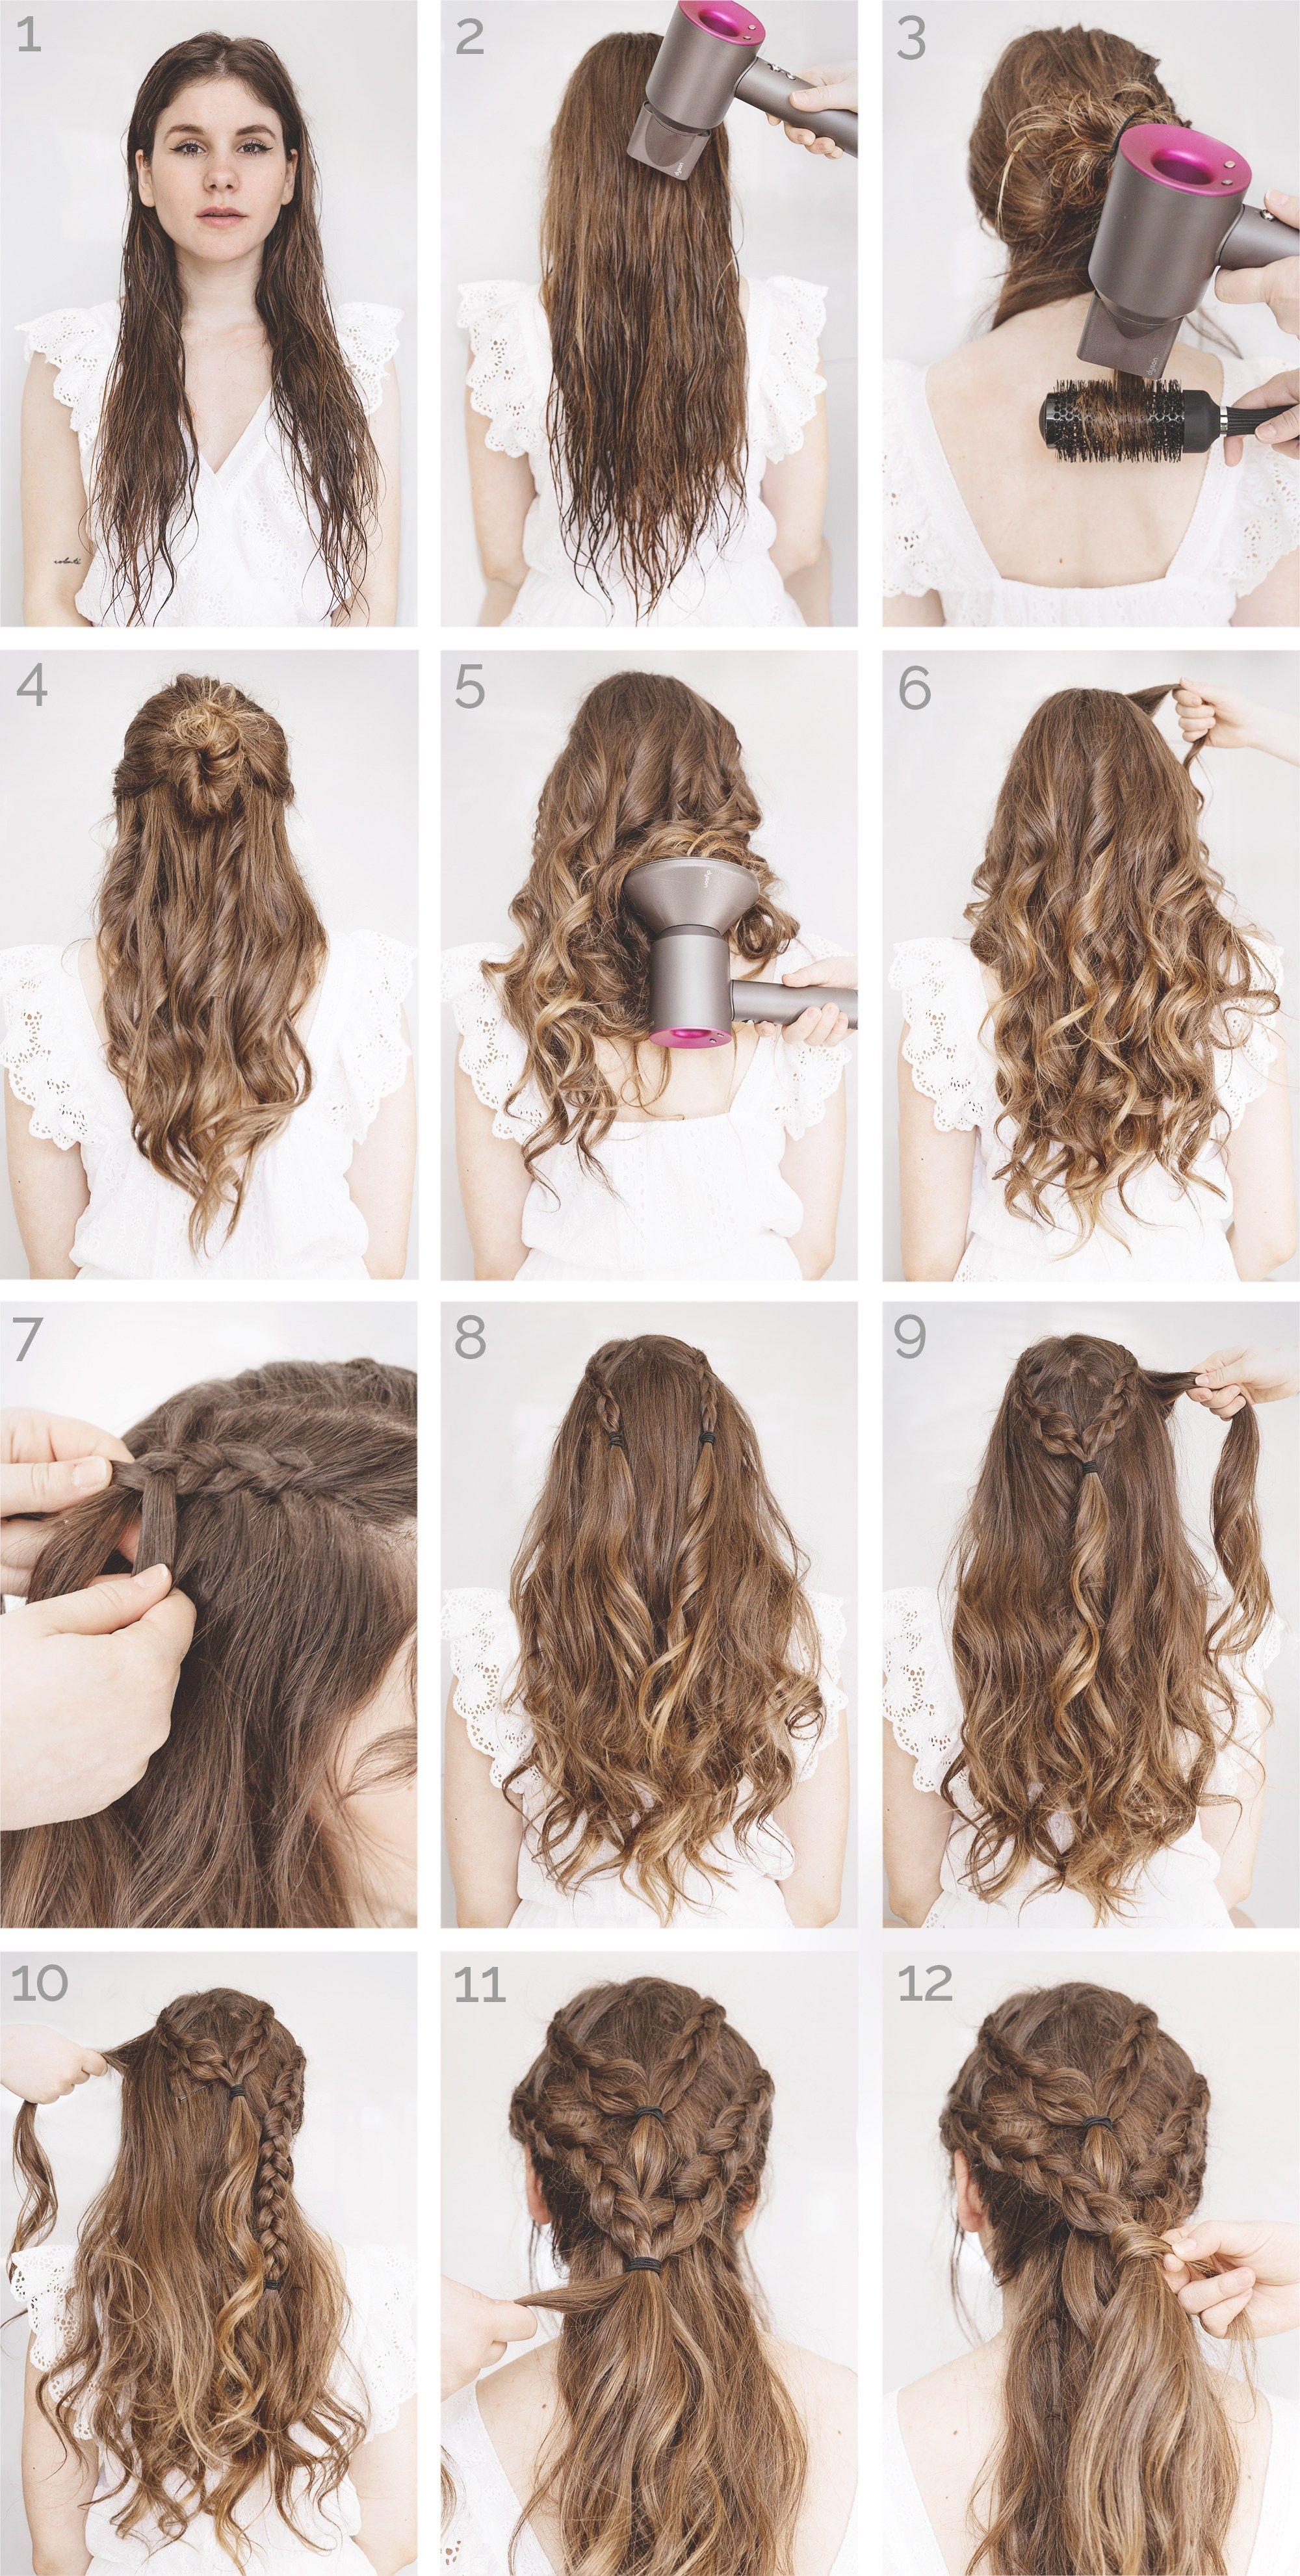 Schones Frisuren Tutorial Hair Do With Bang Hair Styles Long